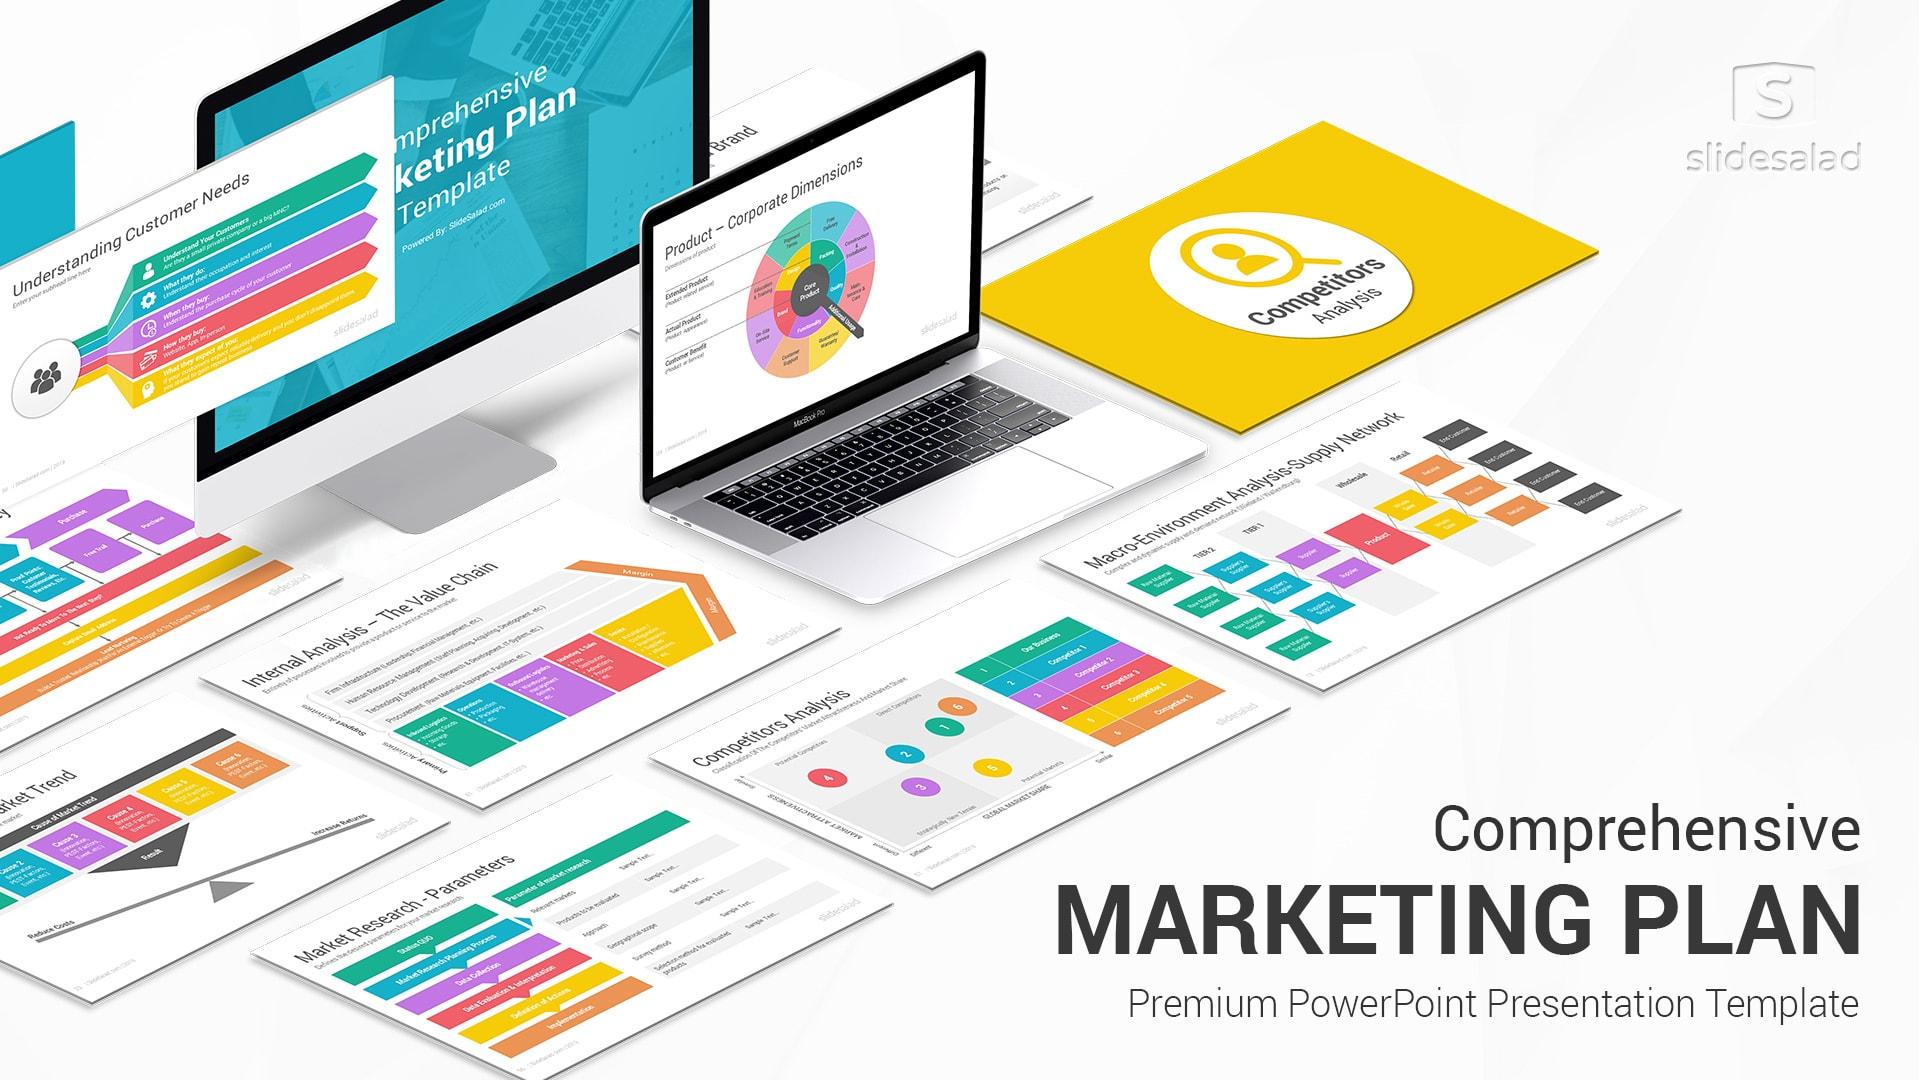 Best Marketing Plan PowerPoint (PPT) Template – Strategic PowerPoint PPT Template